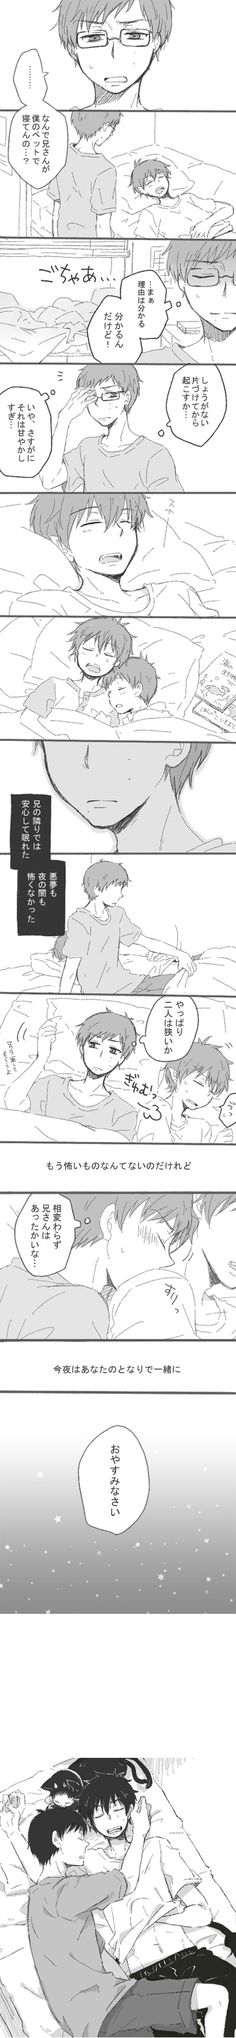 Tags: Anime, Bed, Pillow, T-shirt, Ao no Exorcist, Okumura Rin, Okumura Yukio